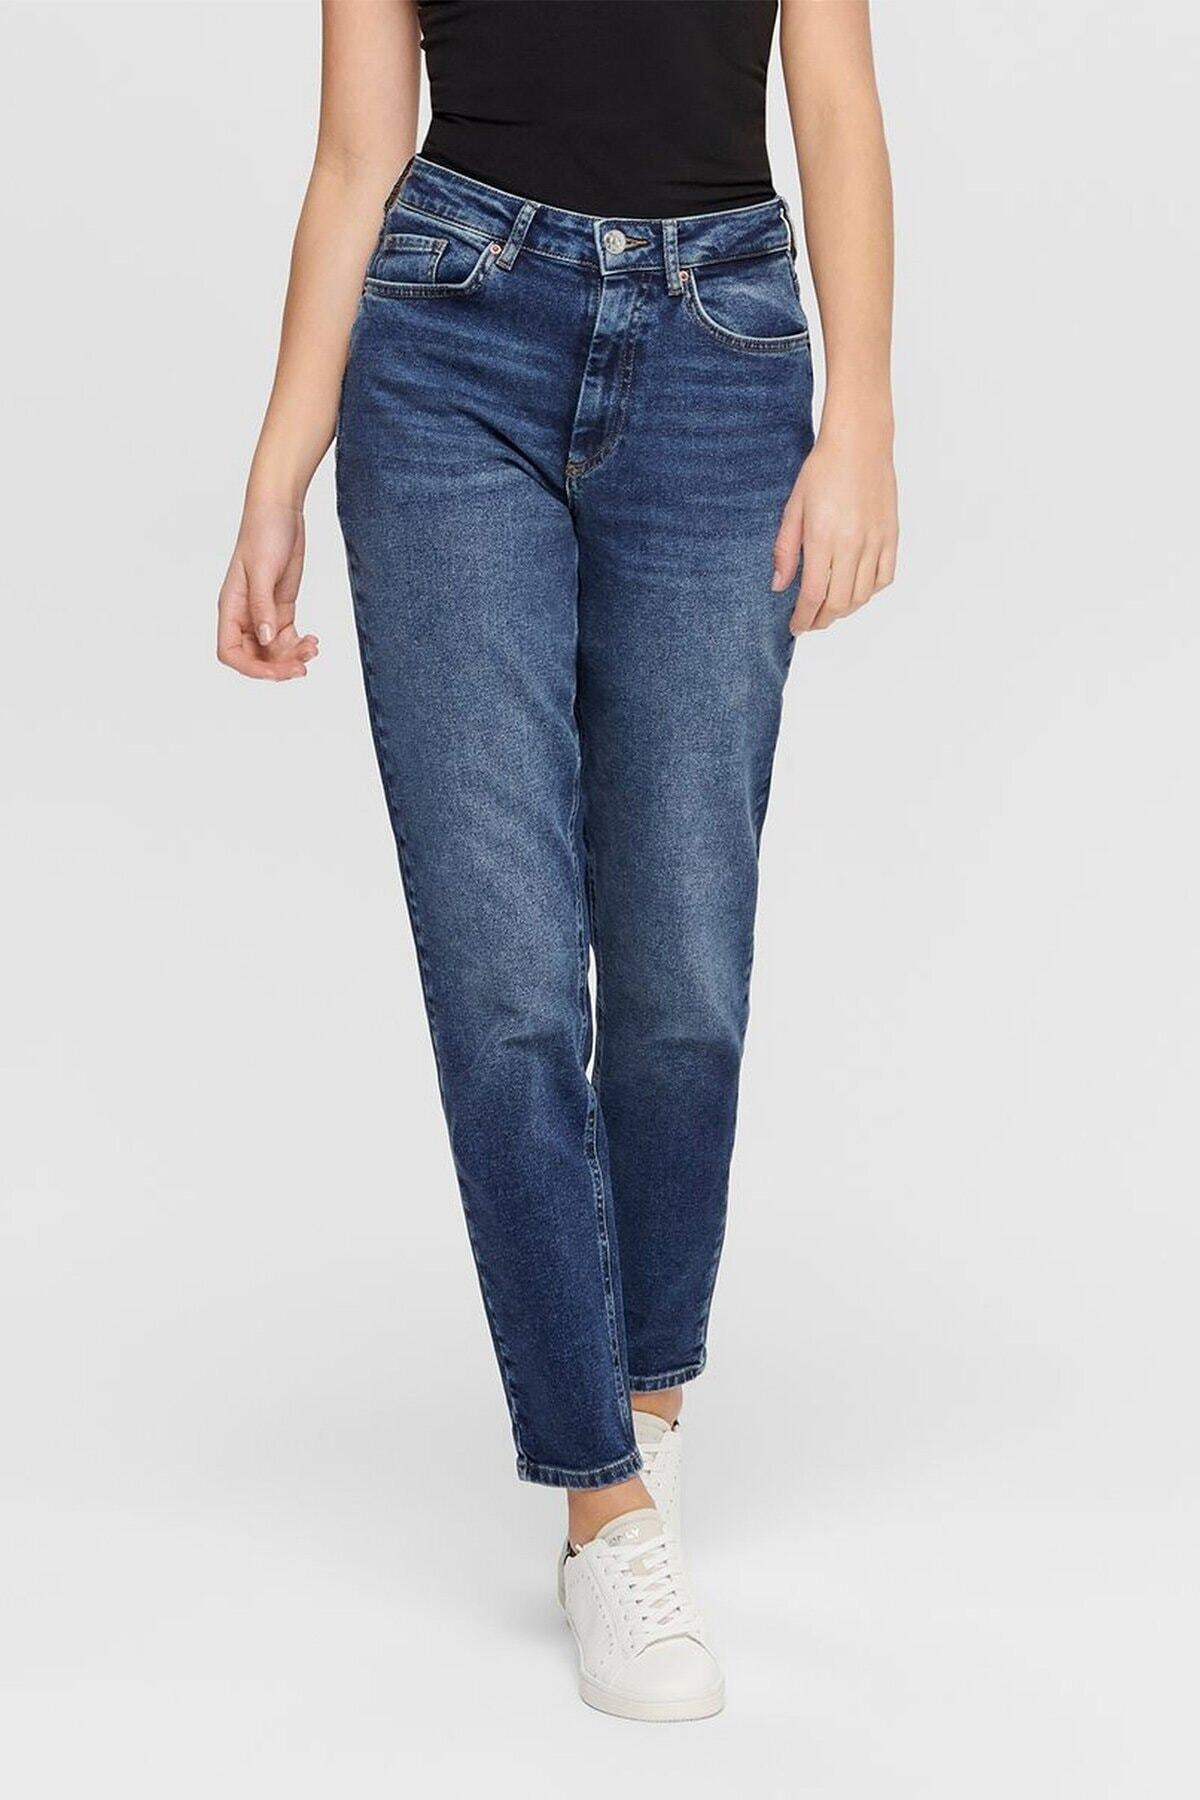 Only Unisex Mavi Veneda Life Mom Jeans 1